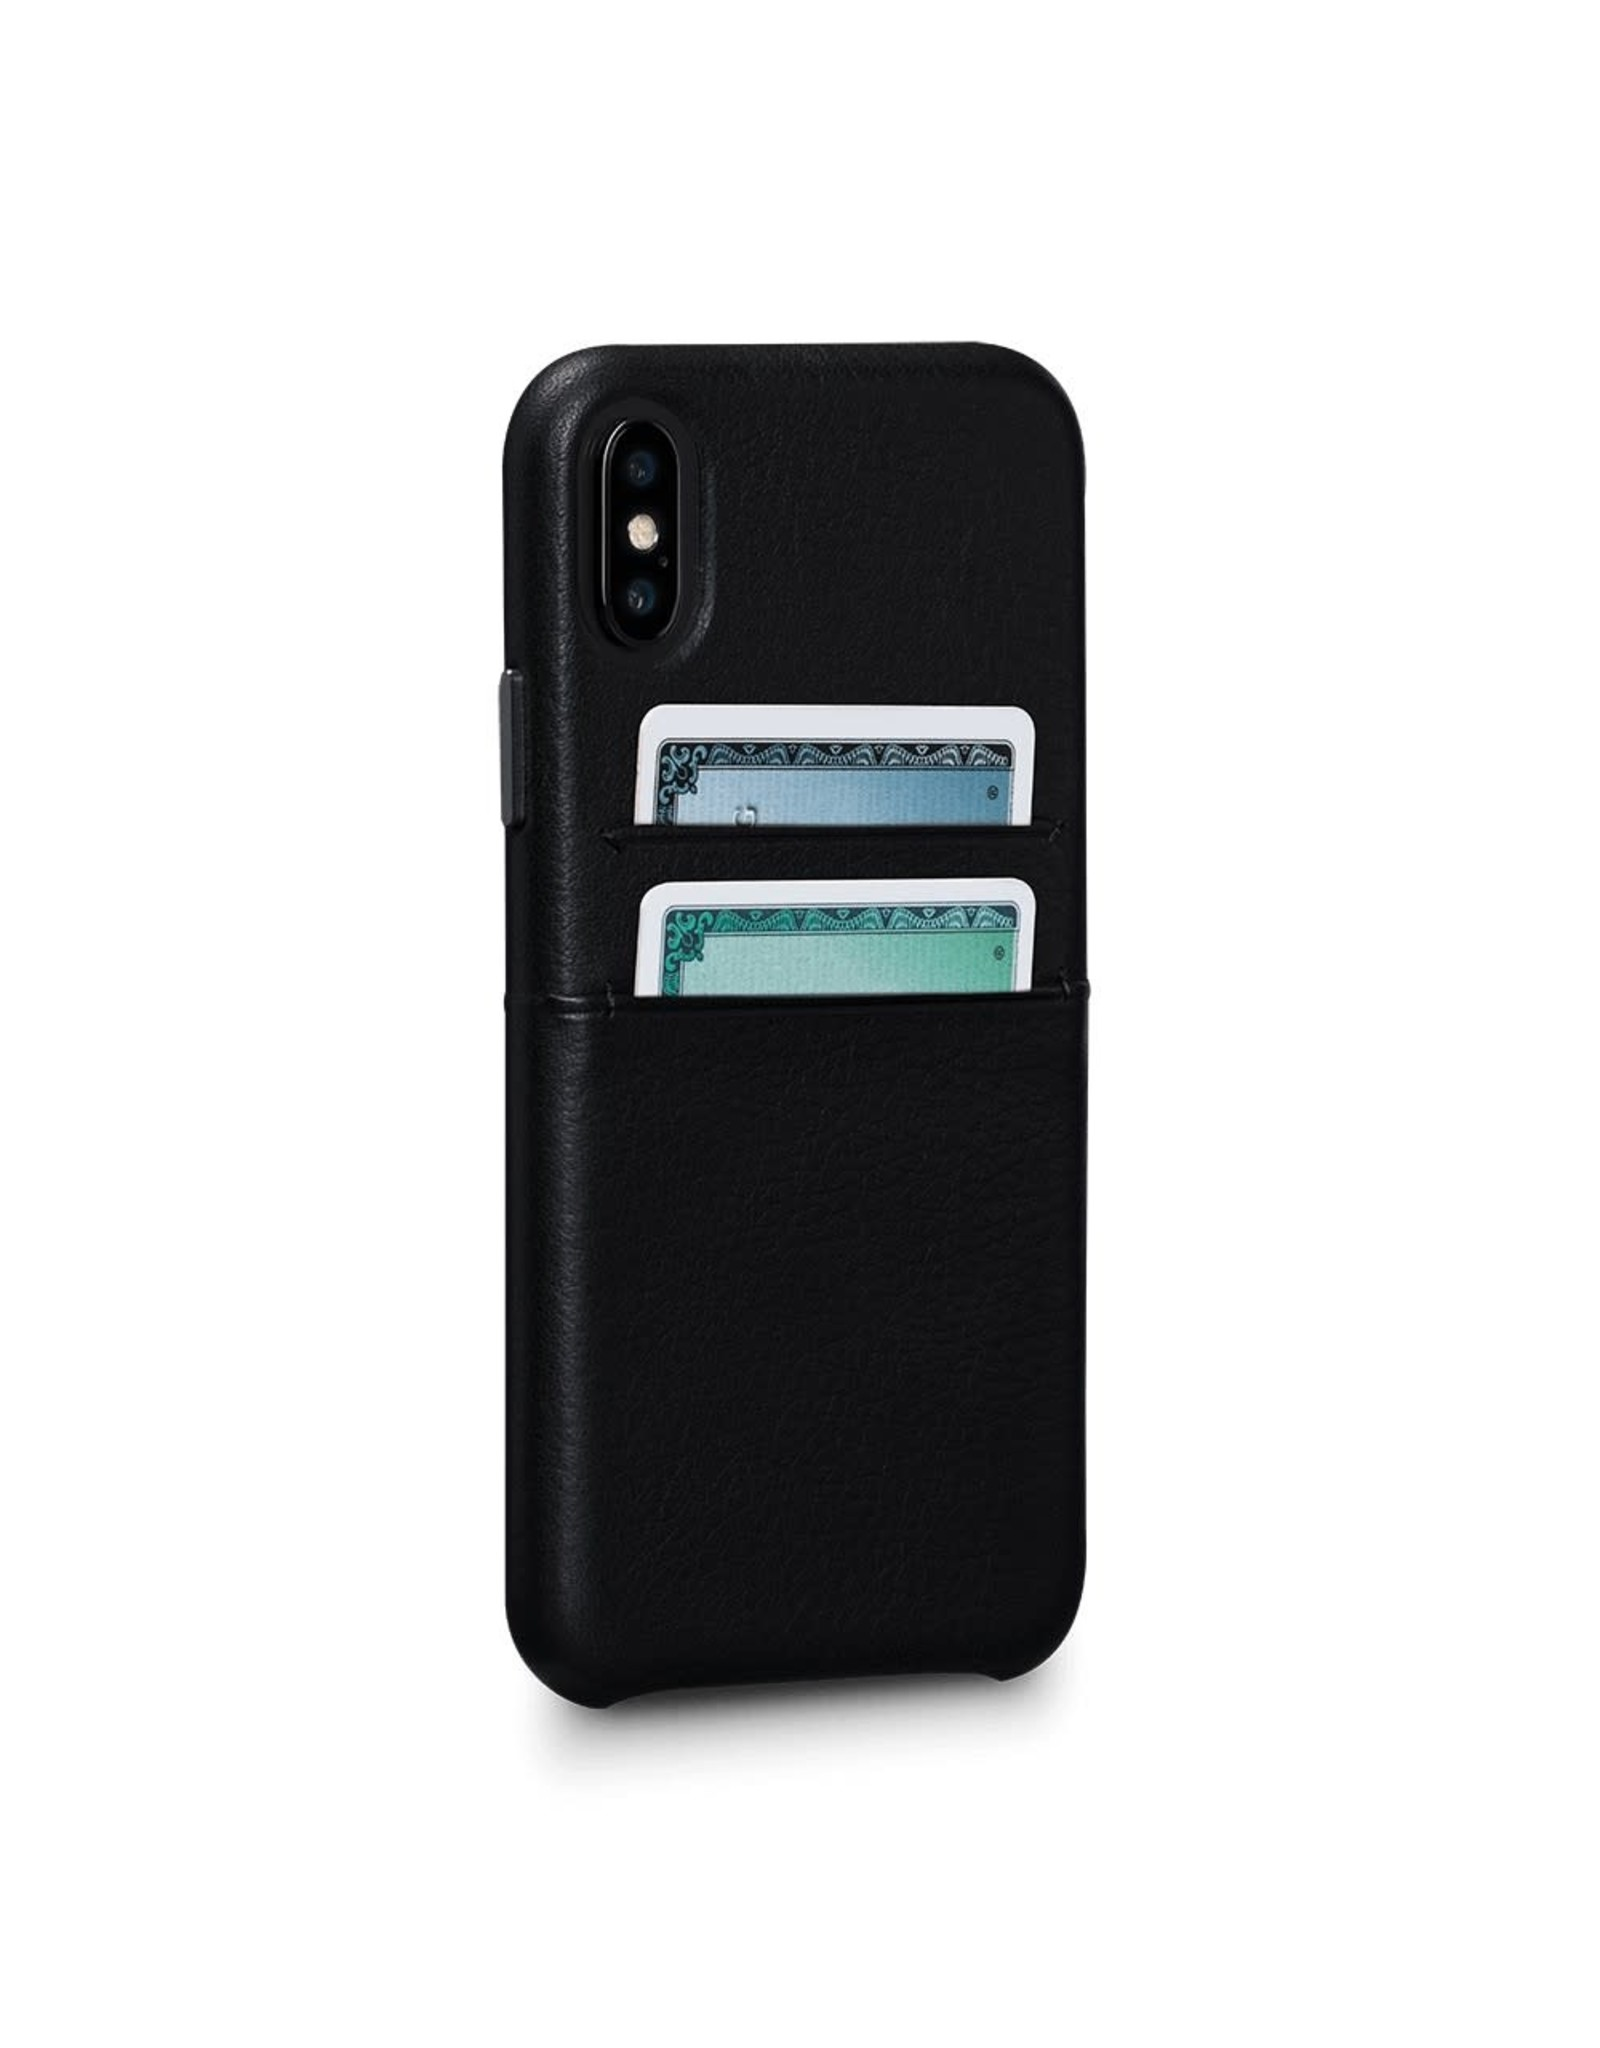 Sena Sena Bence LeatherSkin case for iPhone X - Black EOL